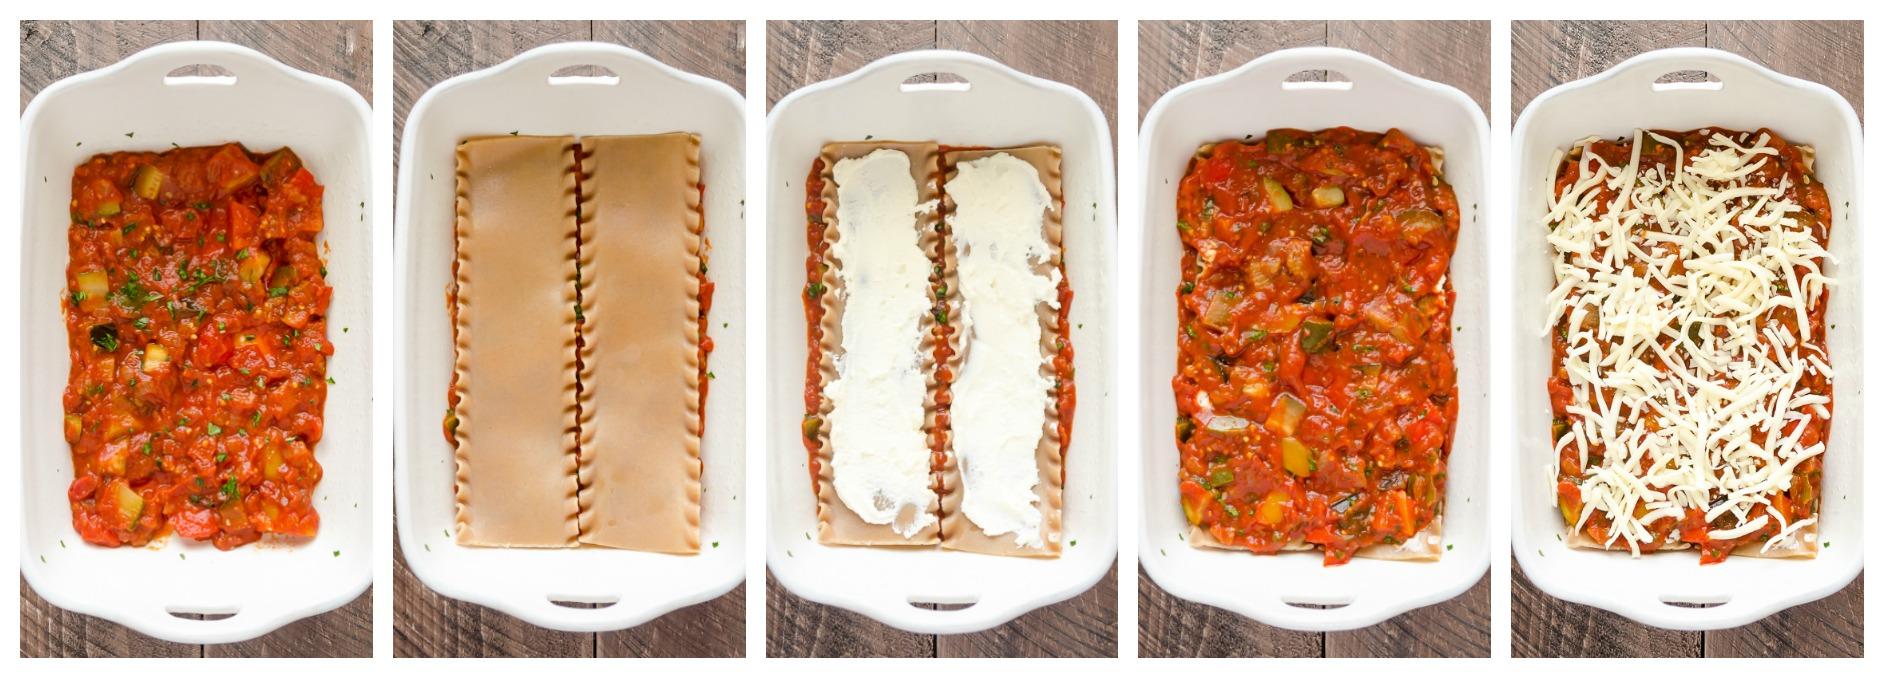 Ratatouille Lasagna process